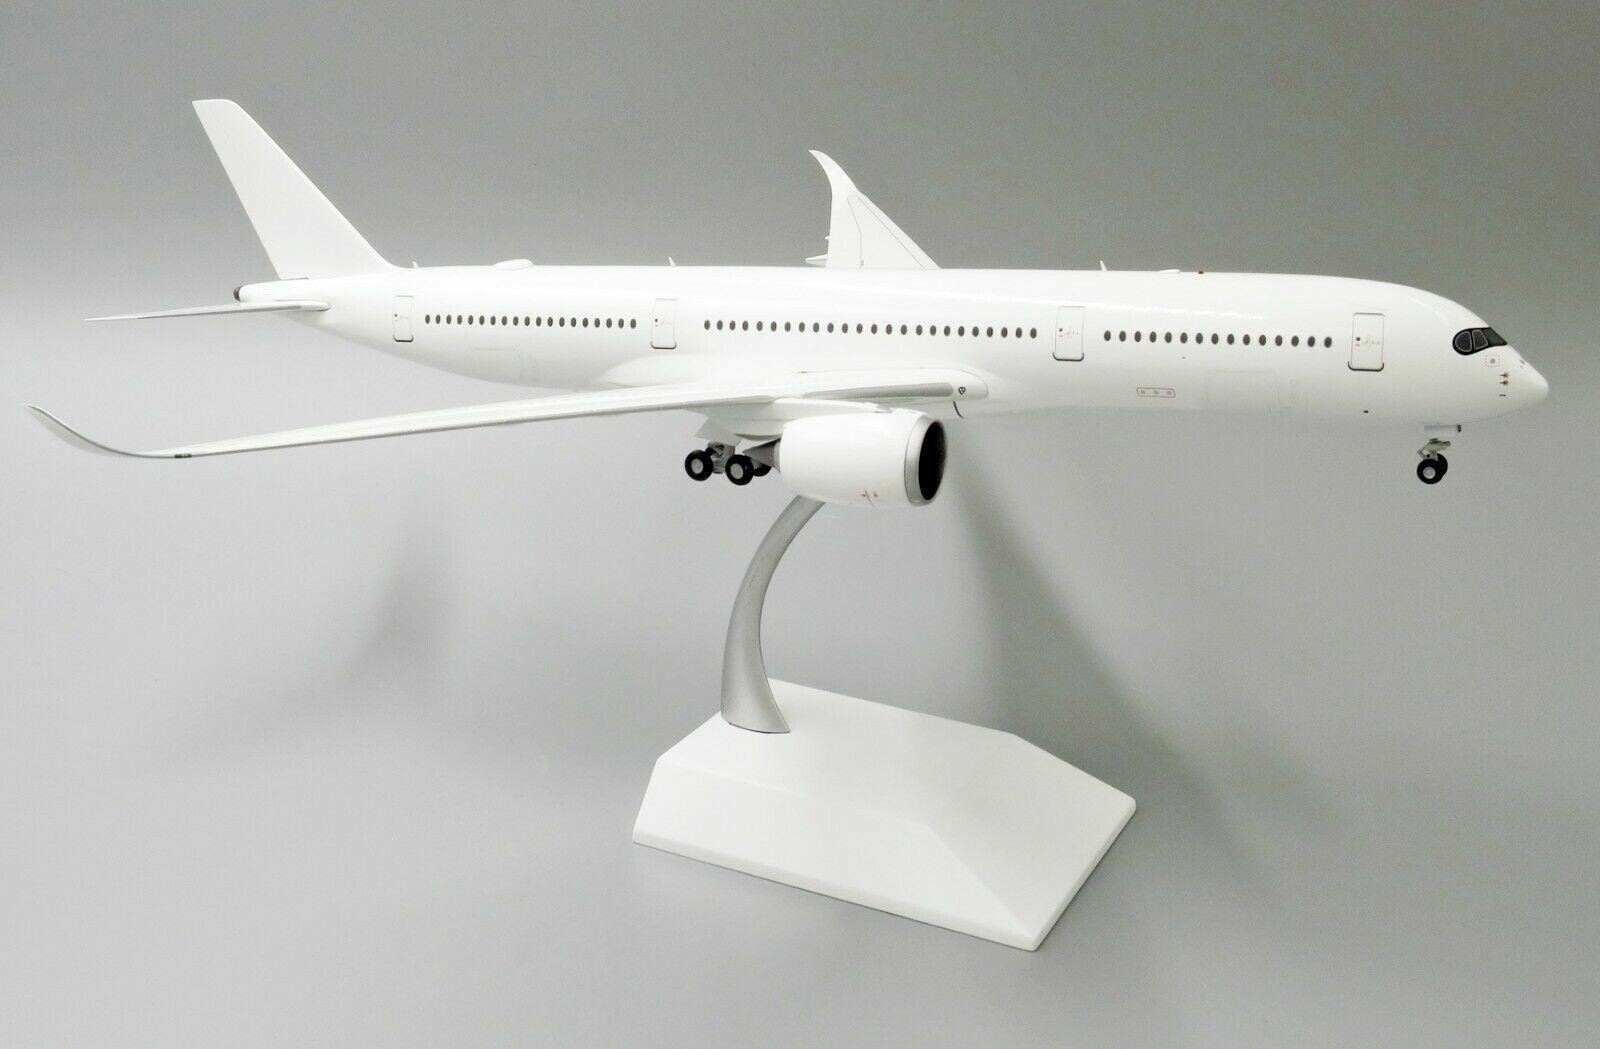 JC Wings 1 200 Blank Model Airbus A350-900 XWB (LH2169)